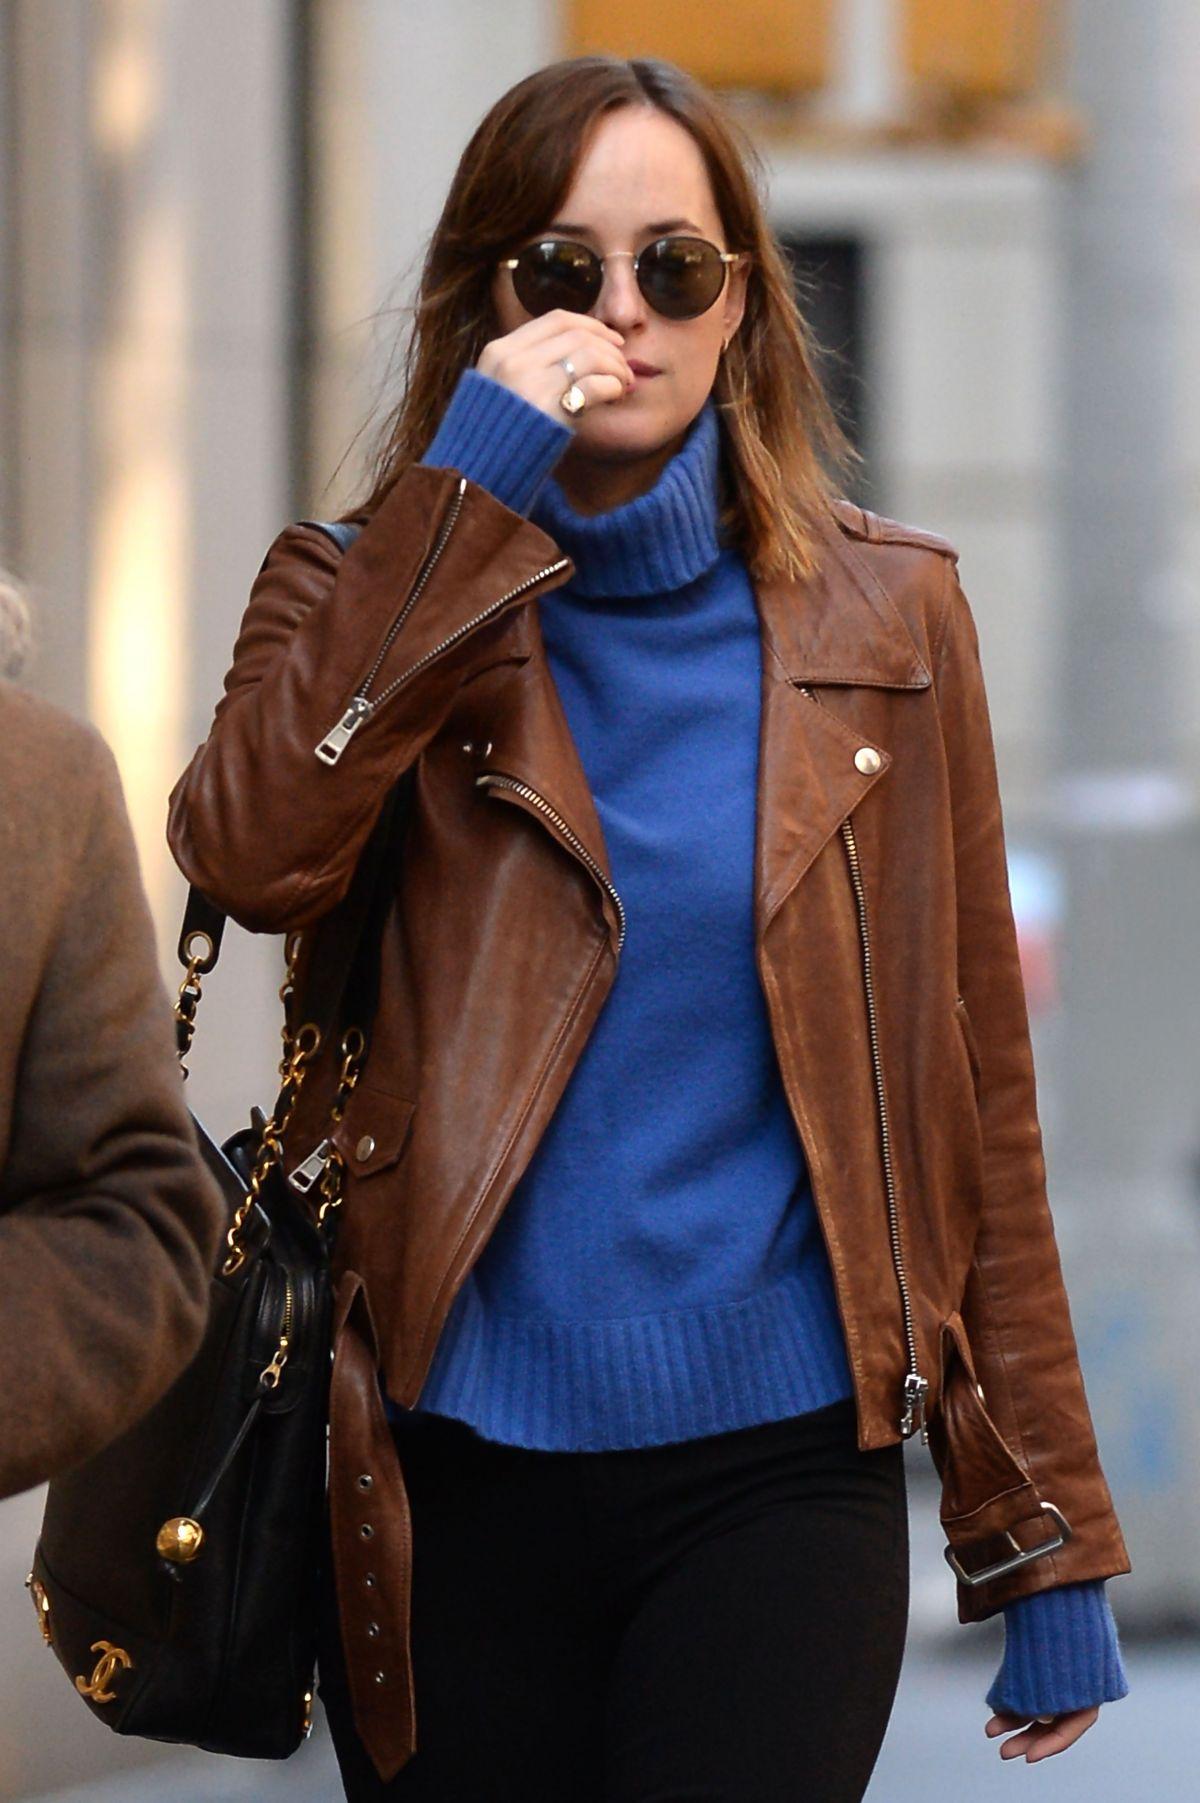 dakota johnson leaves her apartment in new york 12052015 - Brown Apartment 2015